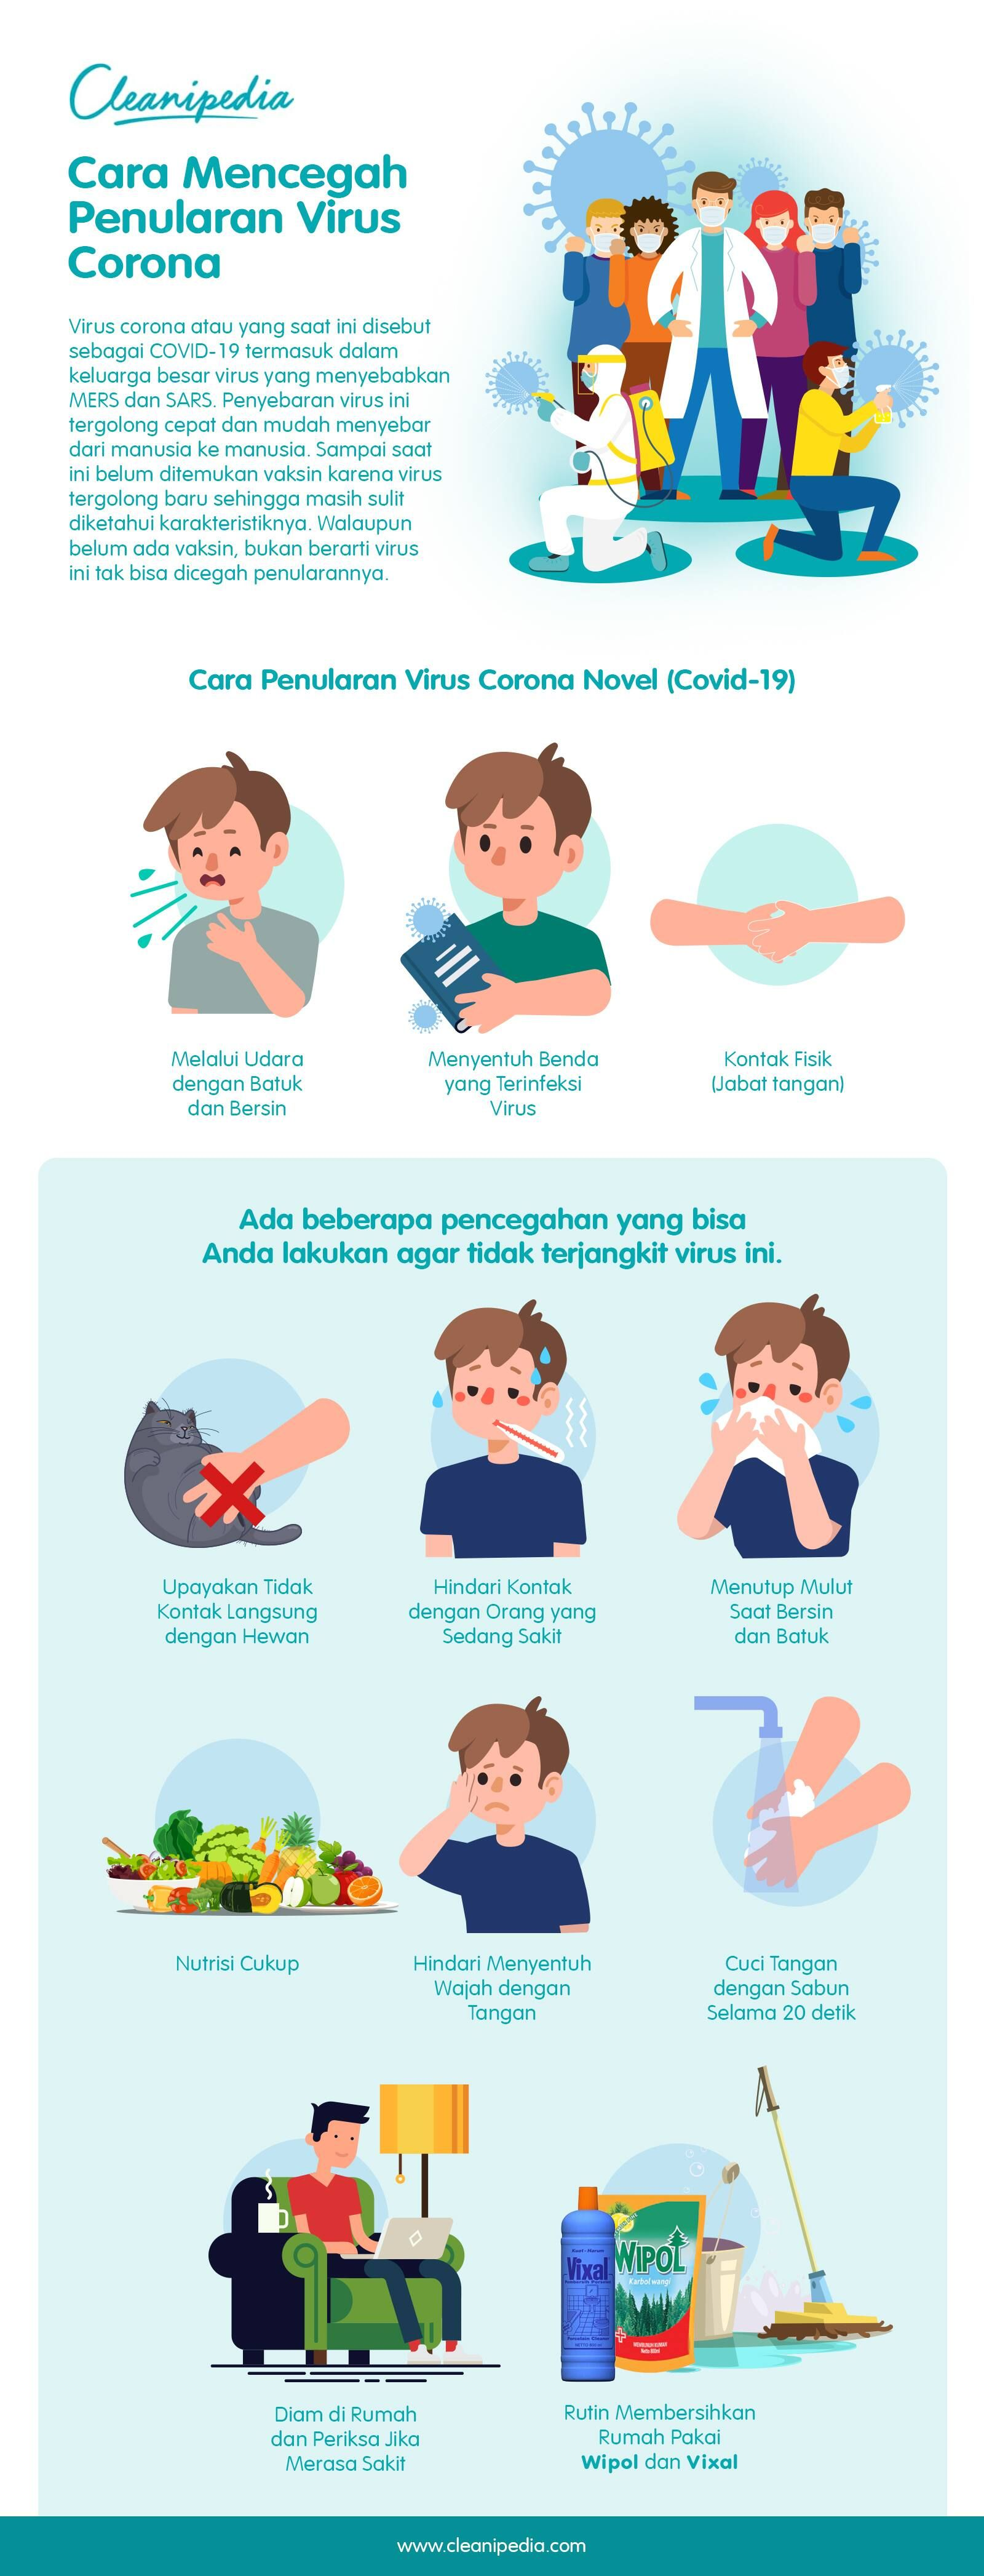 Infografik: Cara Mencegah Penularan Virus Corona